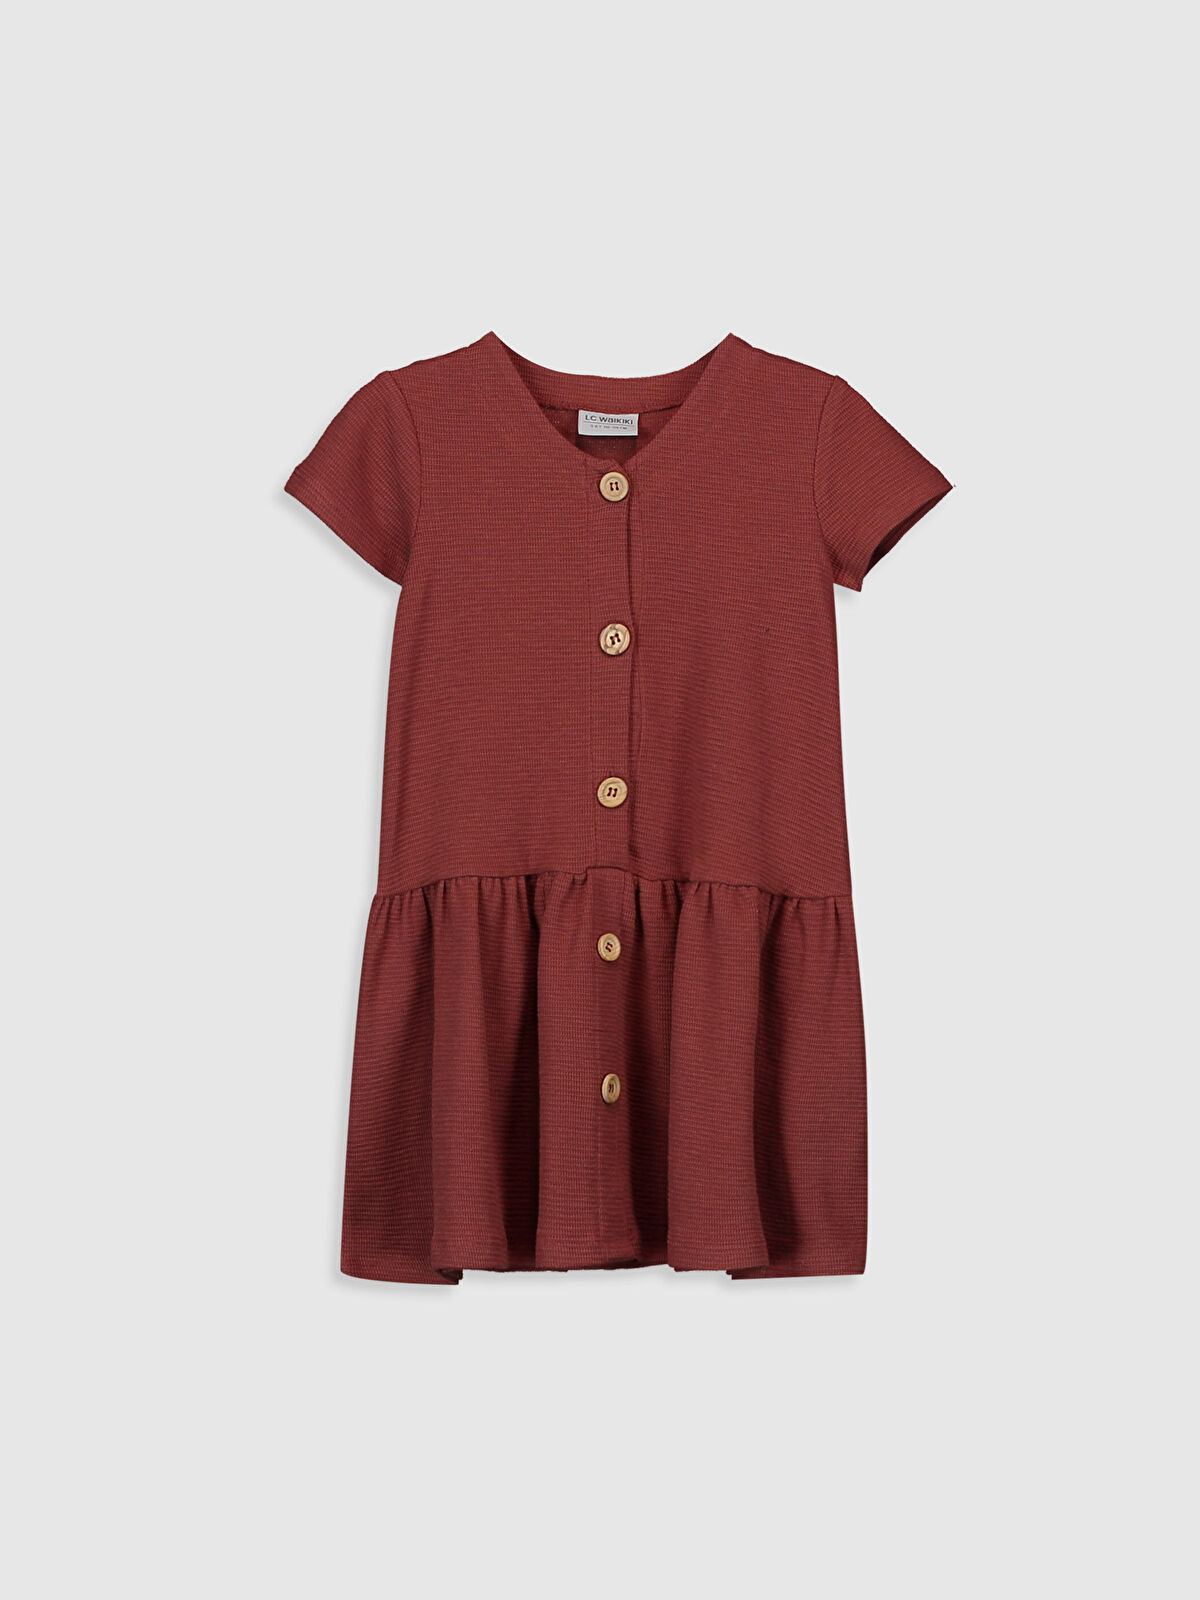 Kız Çocuk Düğme Detaylı Pamuklu Elbise - LC WAIKIKI